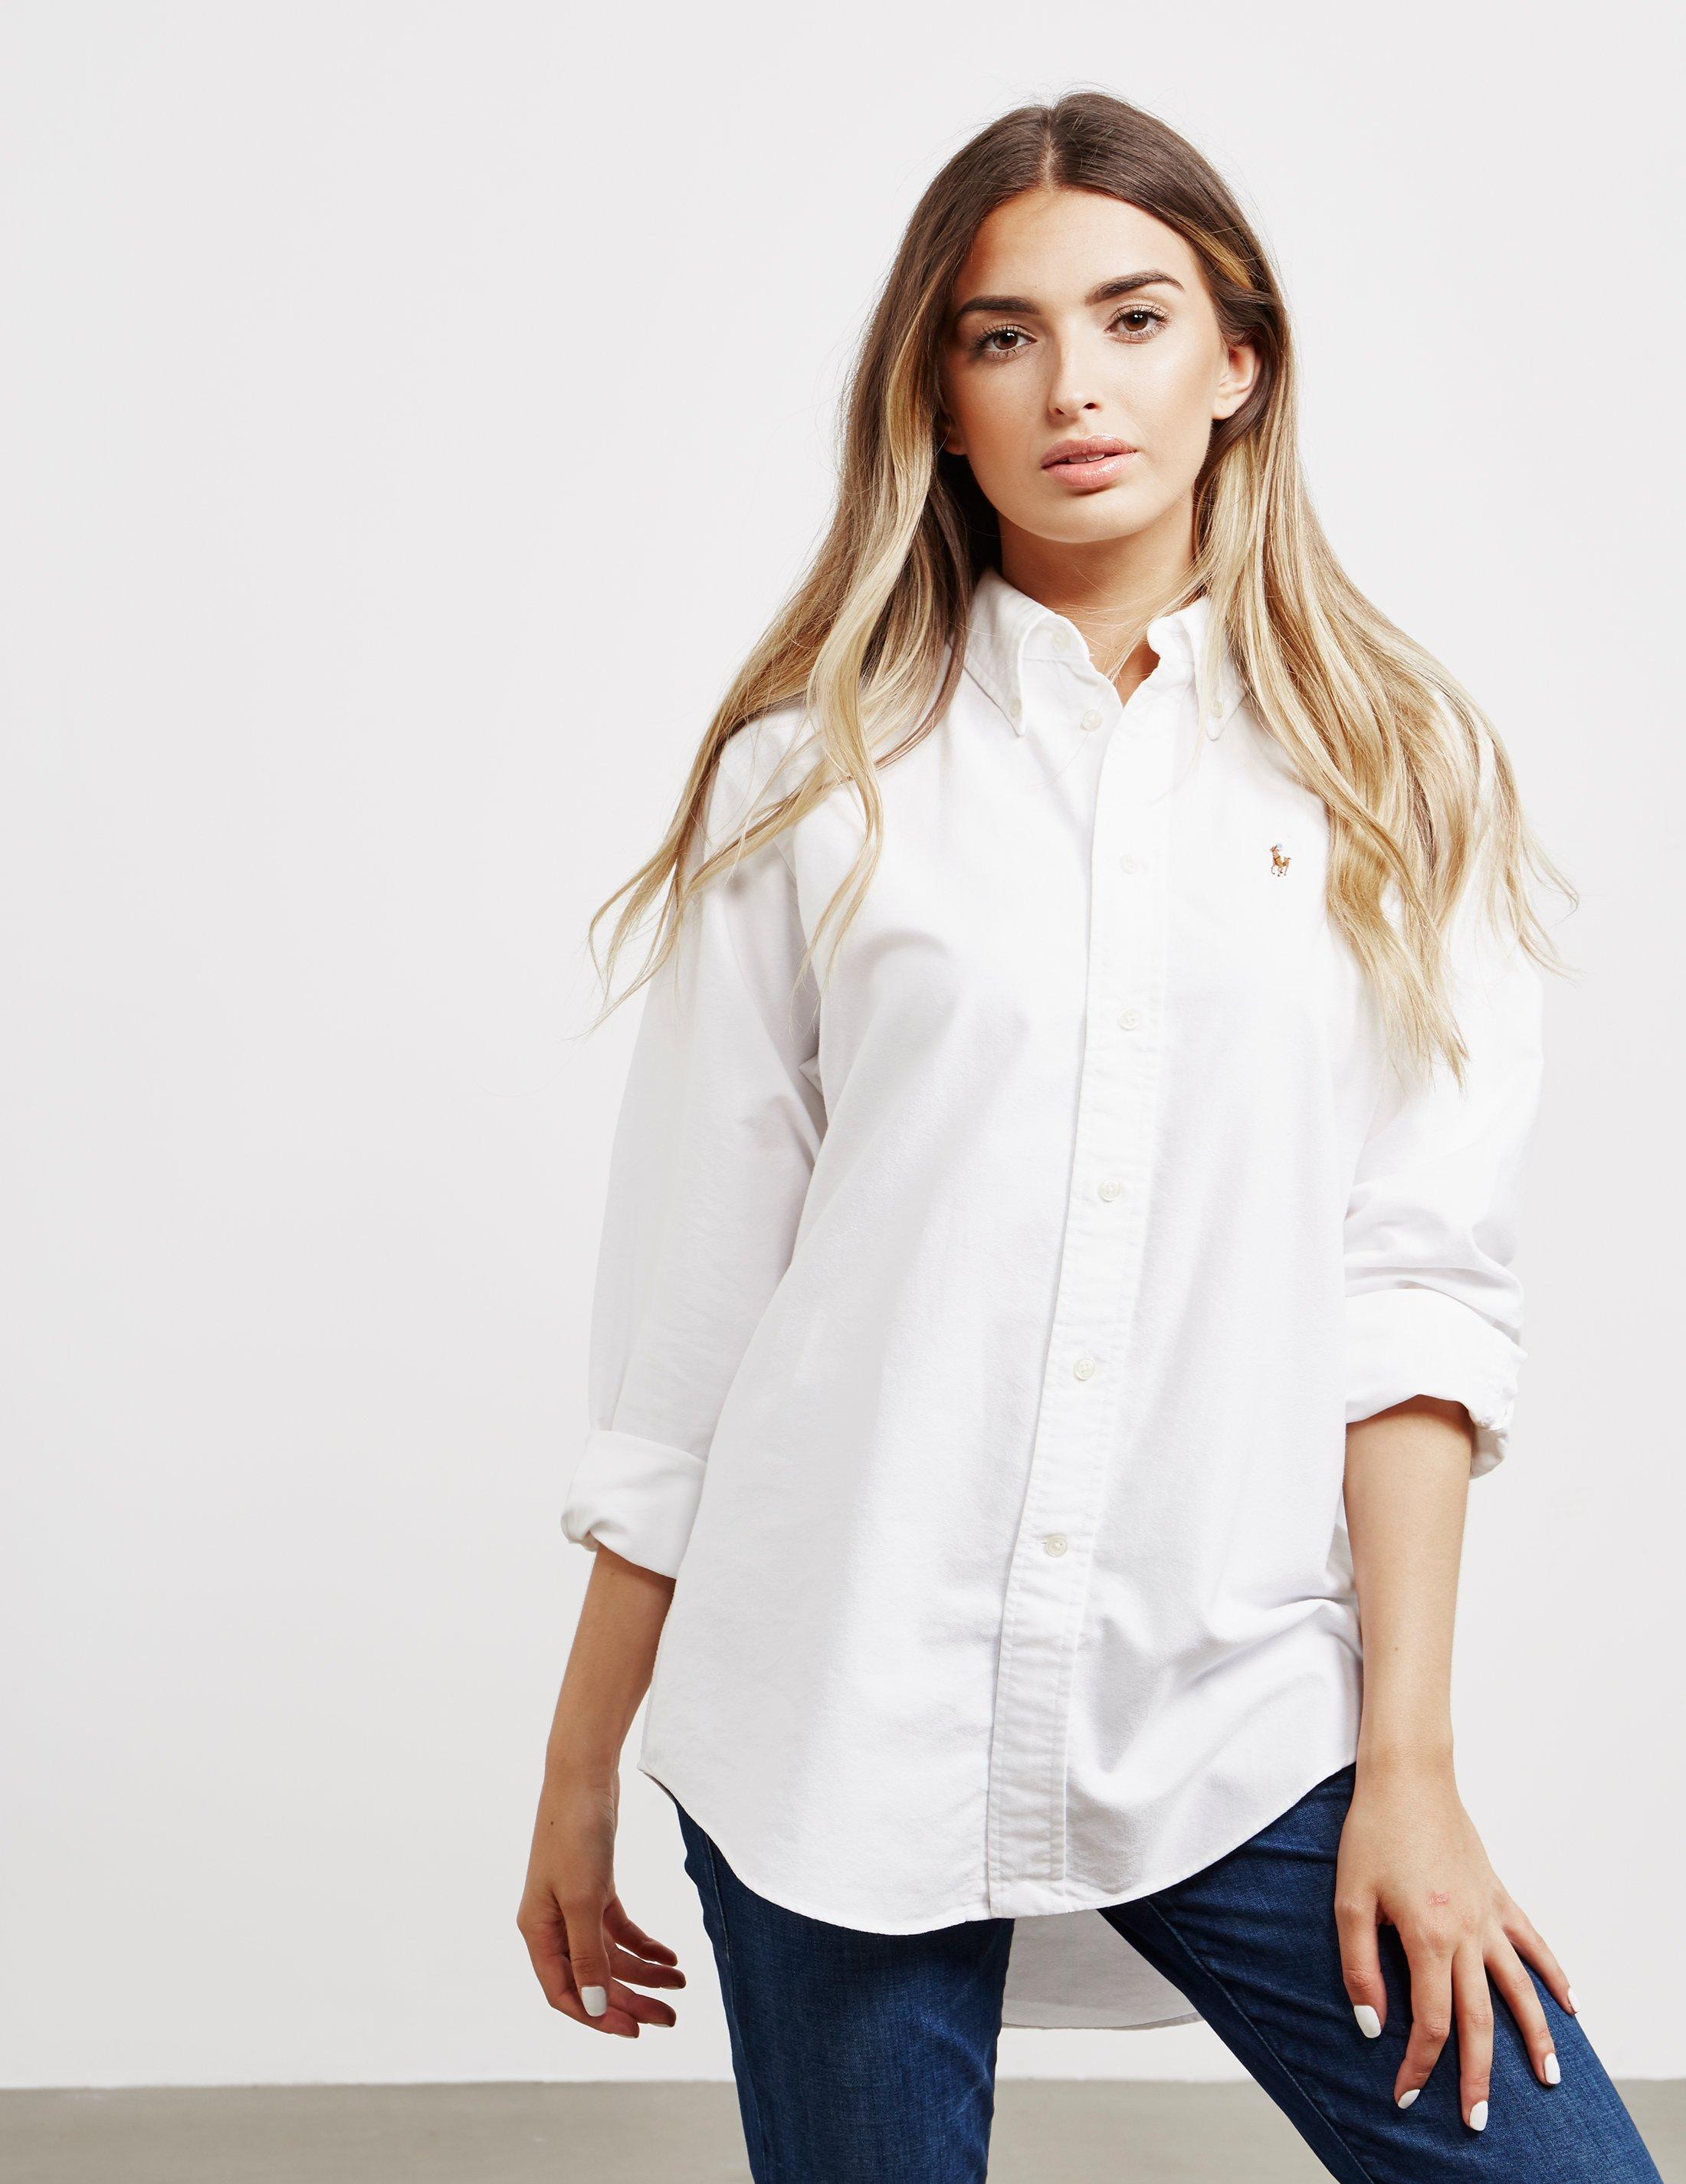 Polo Ralph Lauren Womens Oversized Oxford Long Sleeve Shirt White in ... be41d41884